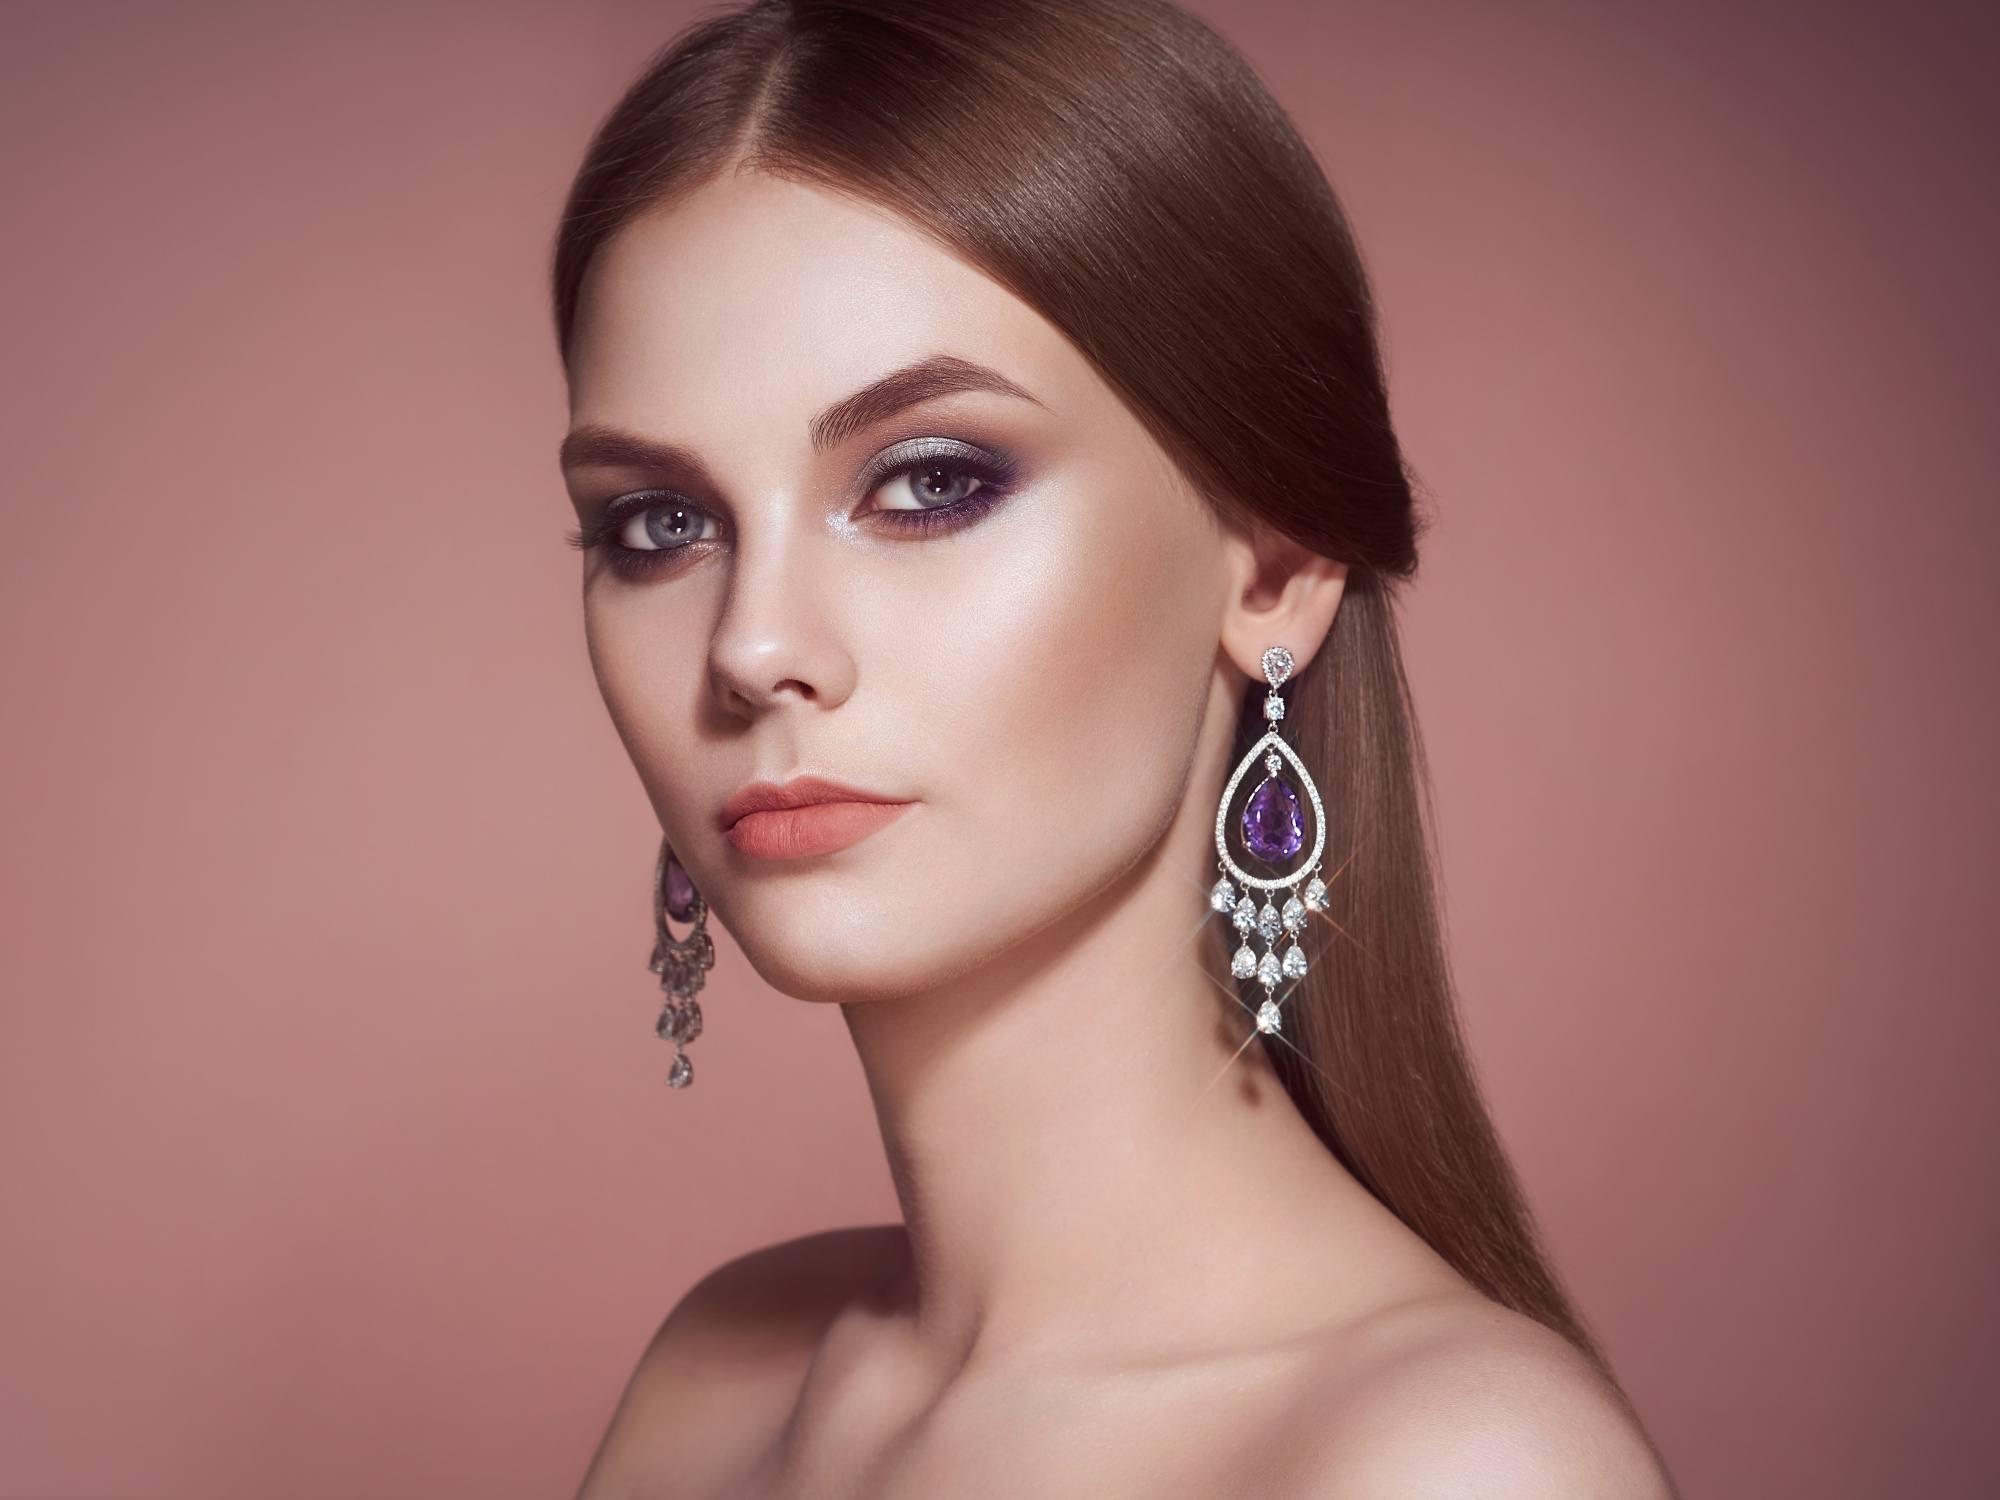 Sleek tied hair: Closeup shot of a Caucasian woman with long brown hair in half ponytail wearing long earrings